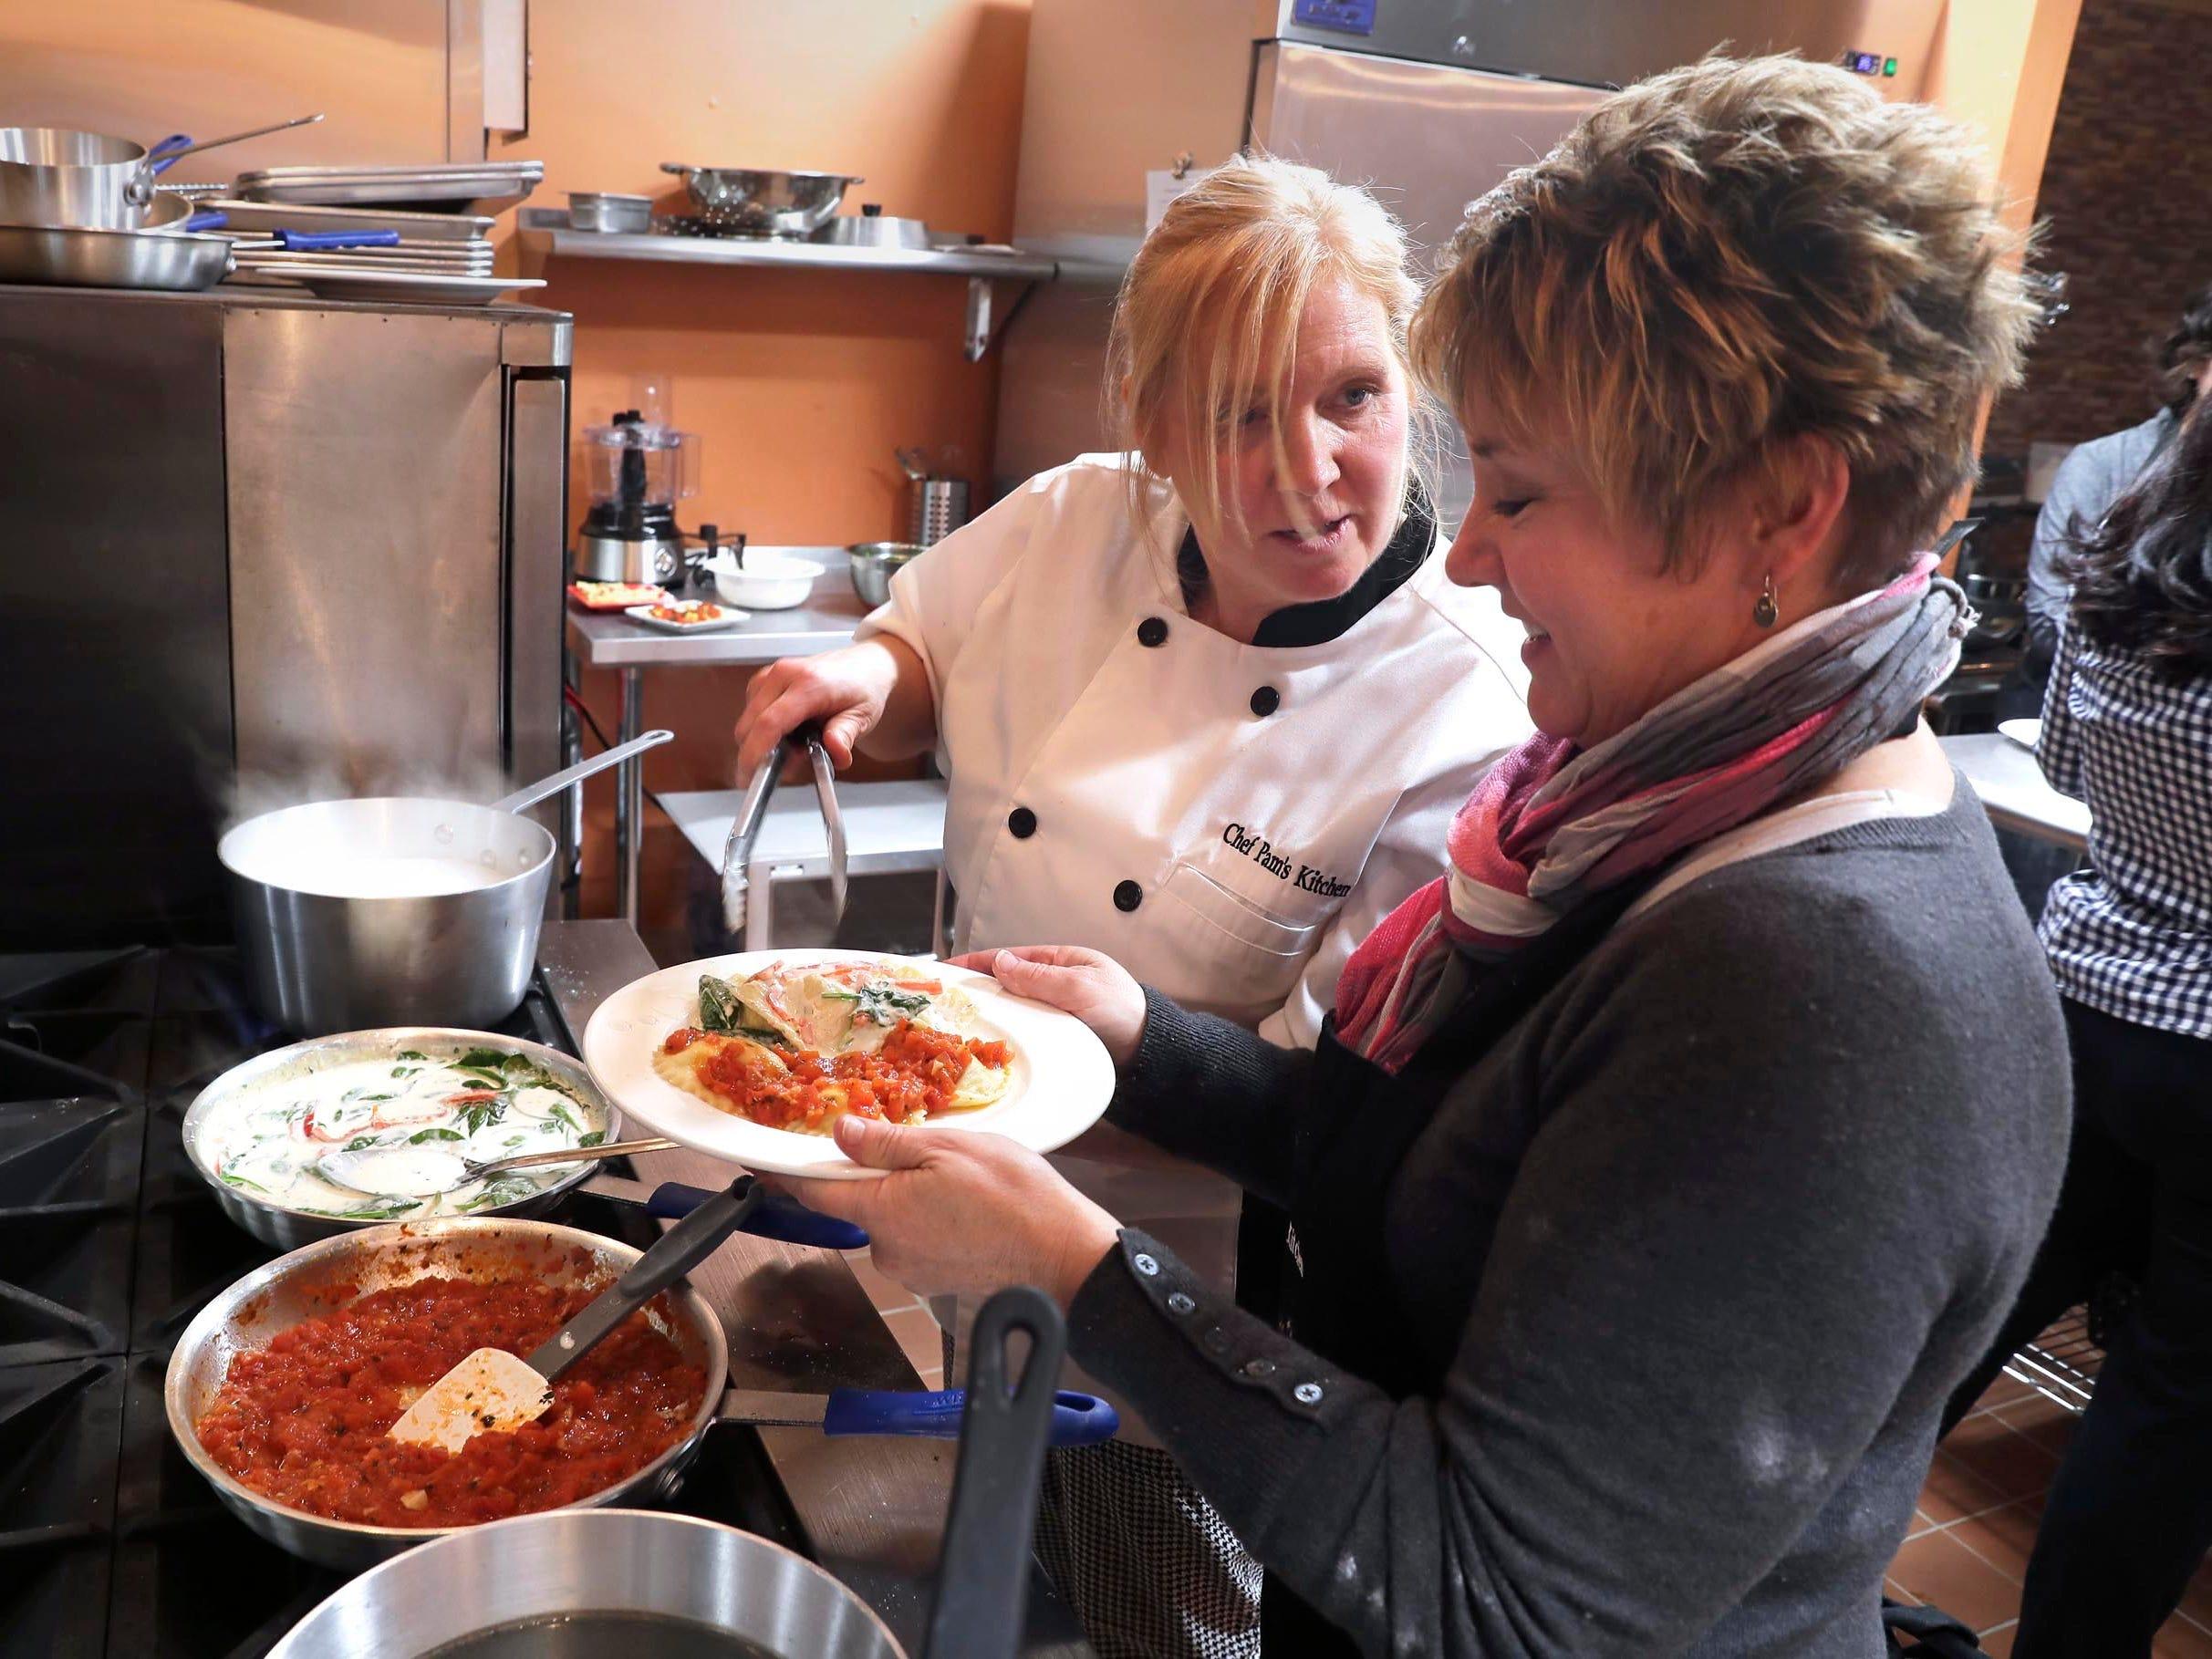 Student Lori Cieslik's ravioli are ready to take to the table.